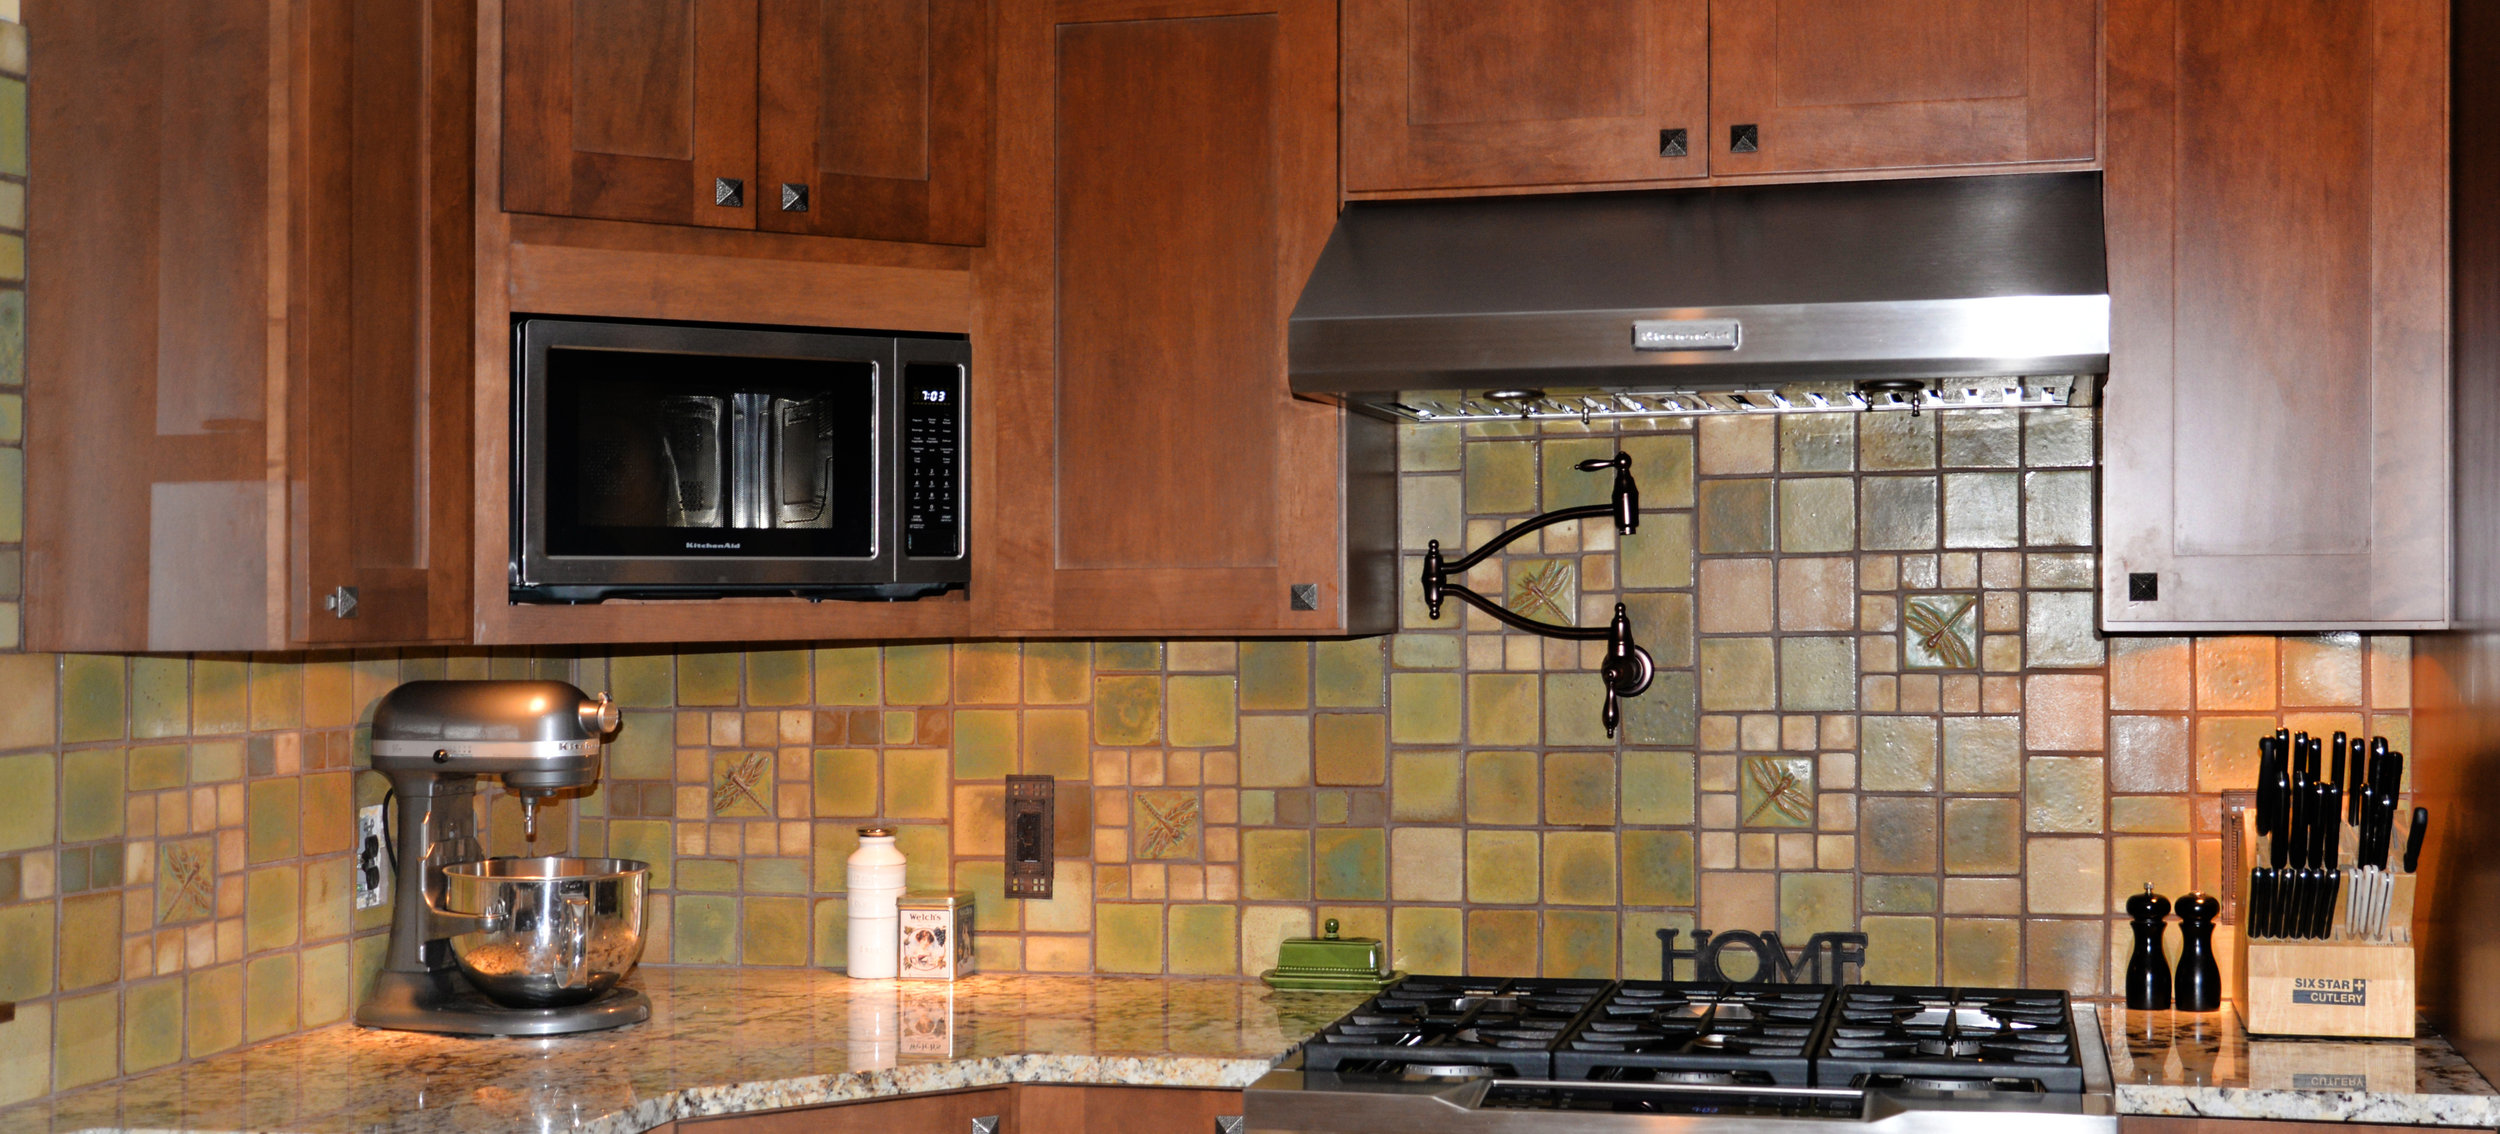 dragonfly kitchen 1.jpg